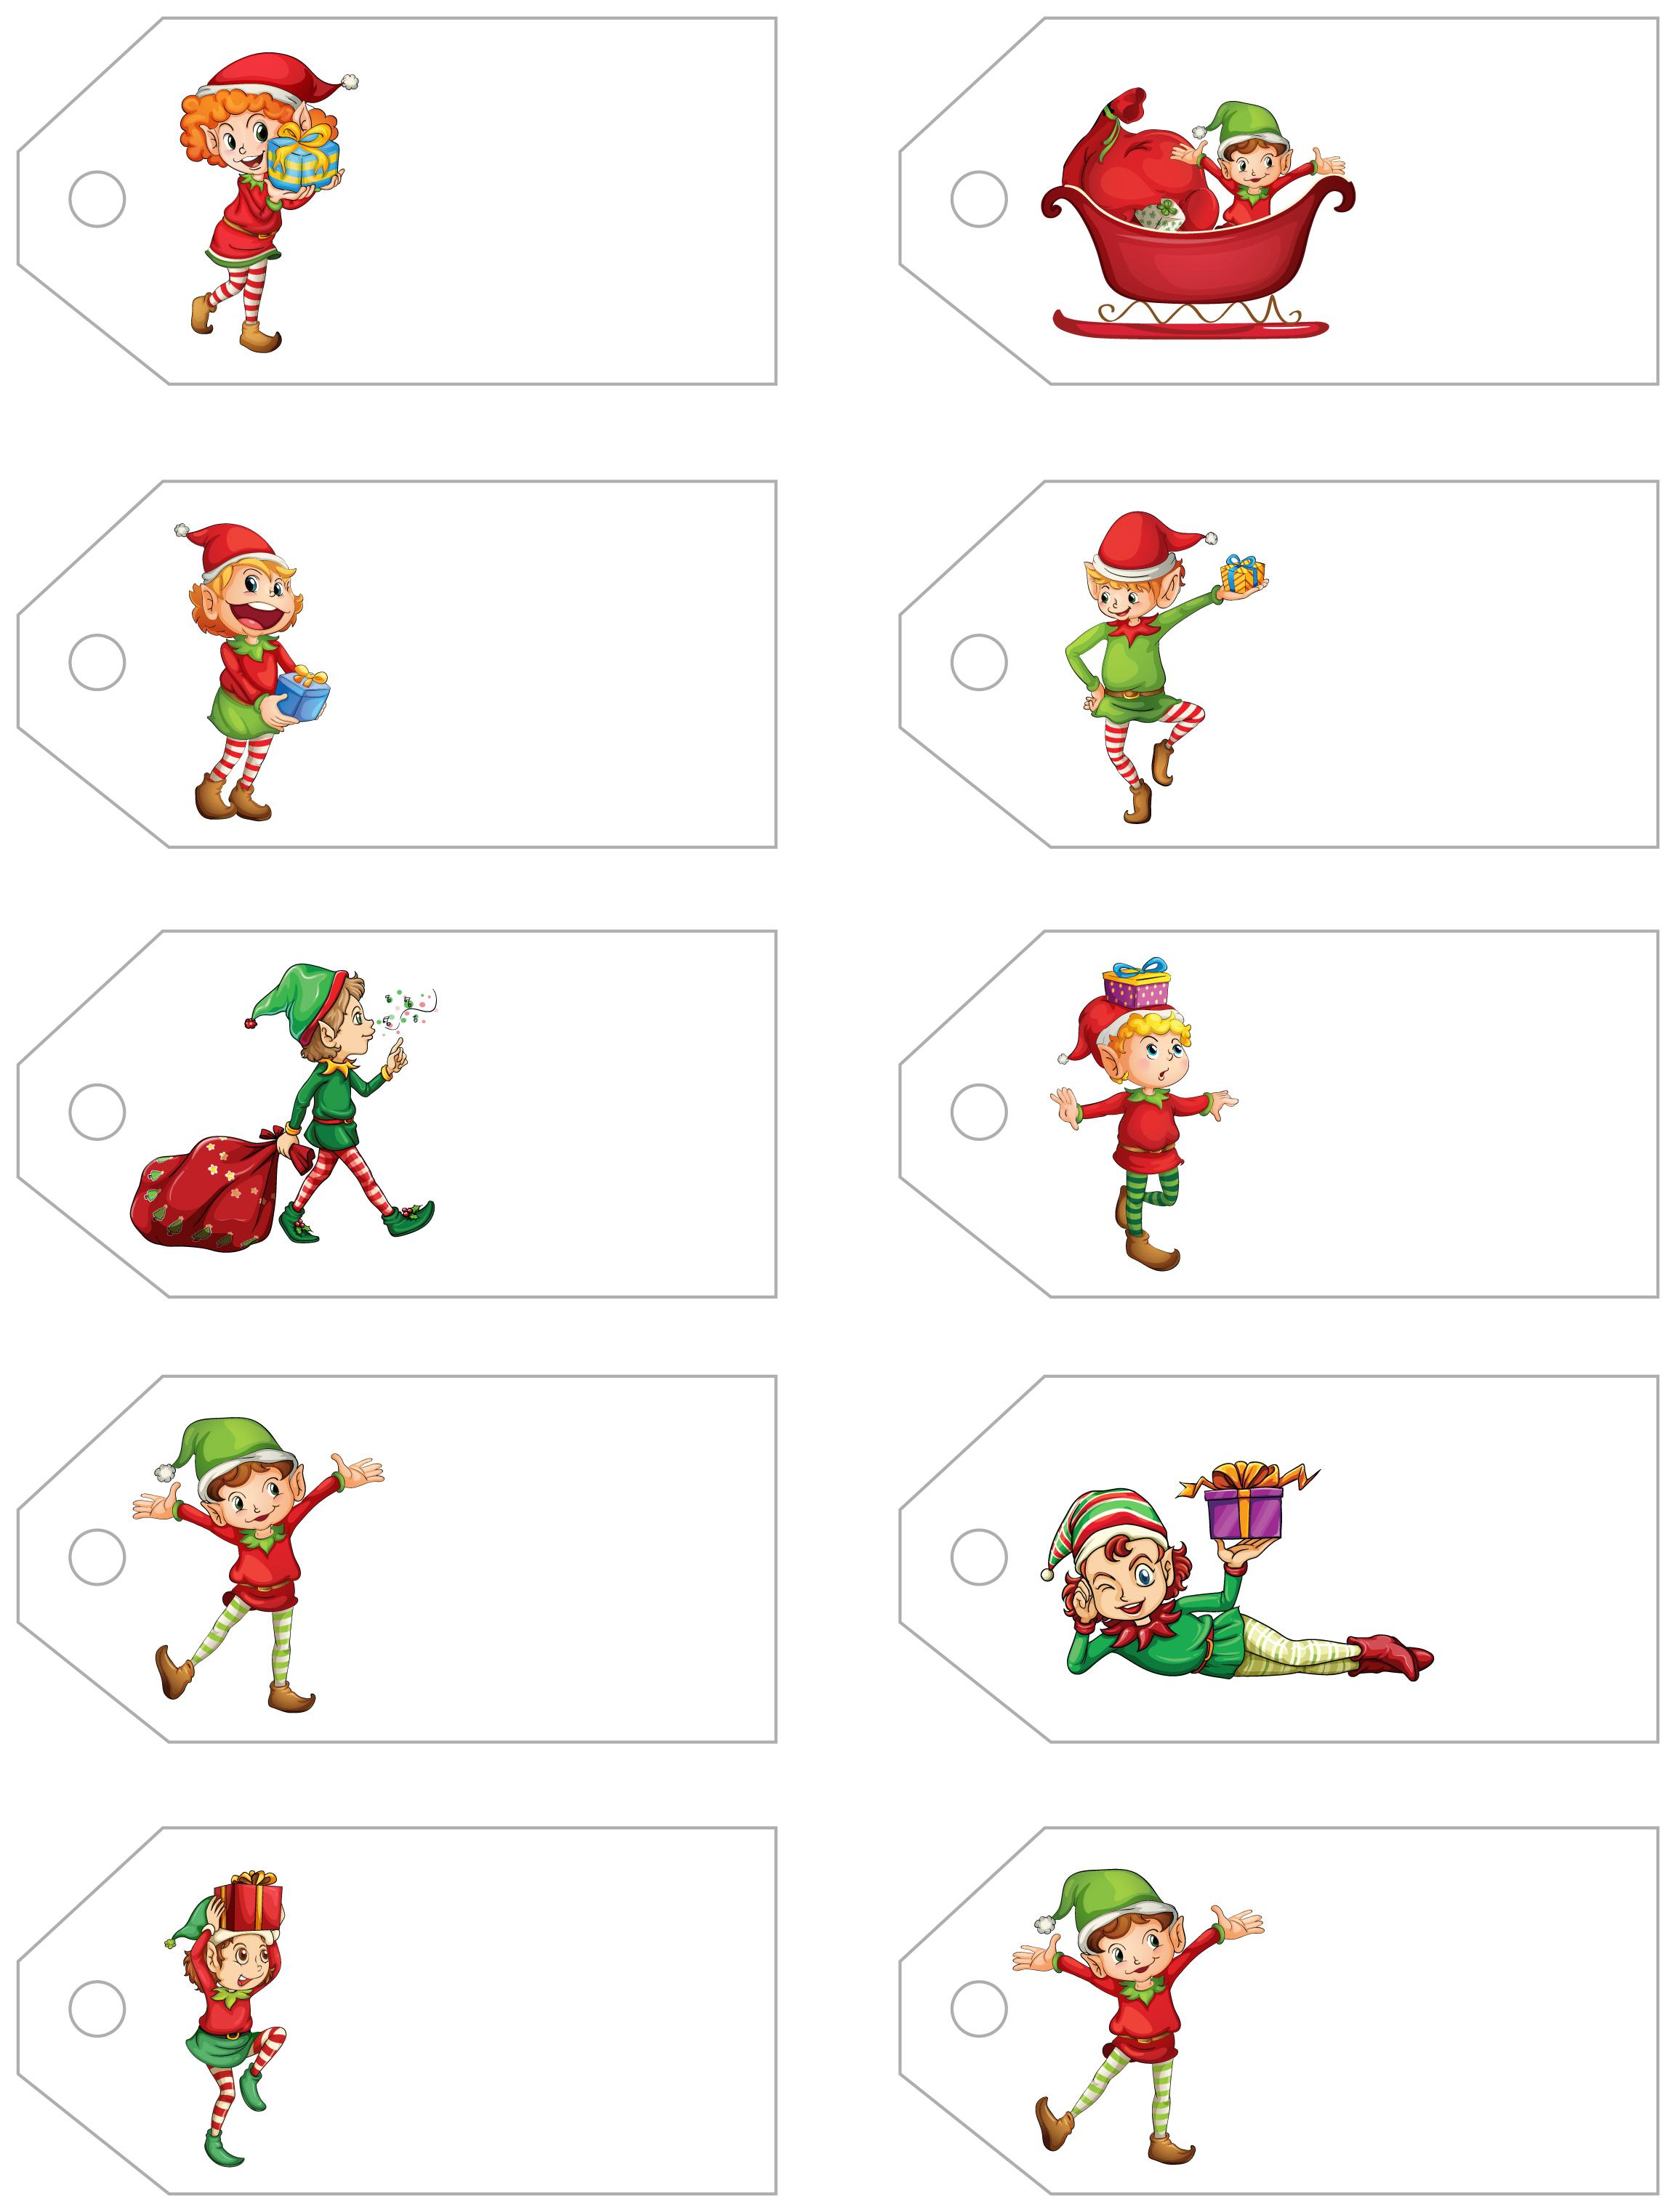 Santa's Little Gift To You! Free Printable Gift Tags And Labels - Free Printable To From Gift Tags